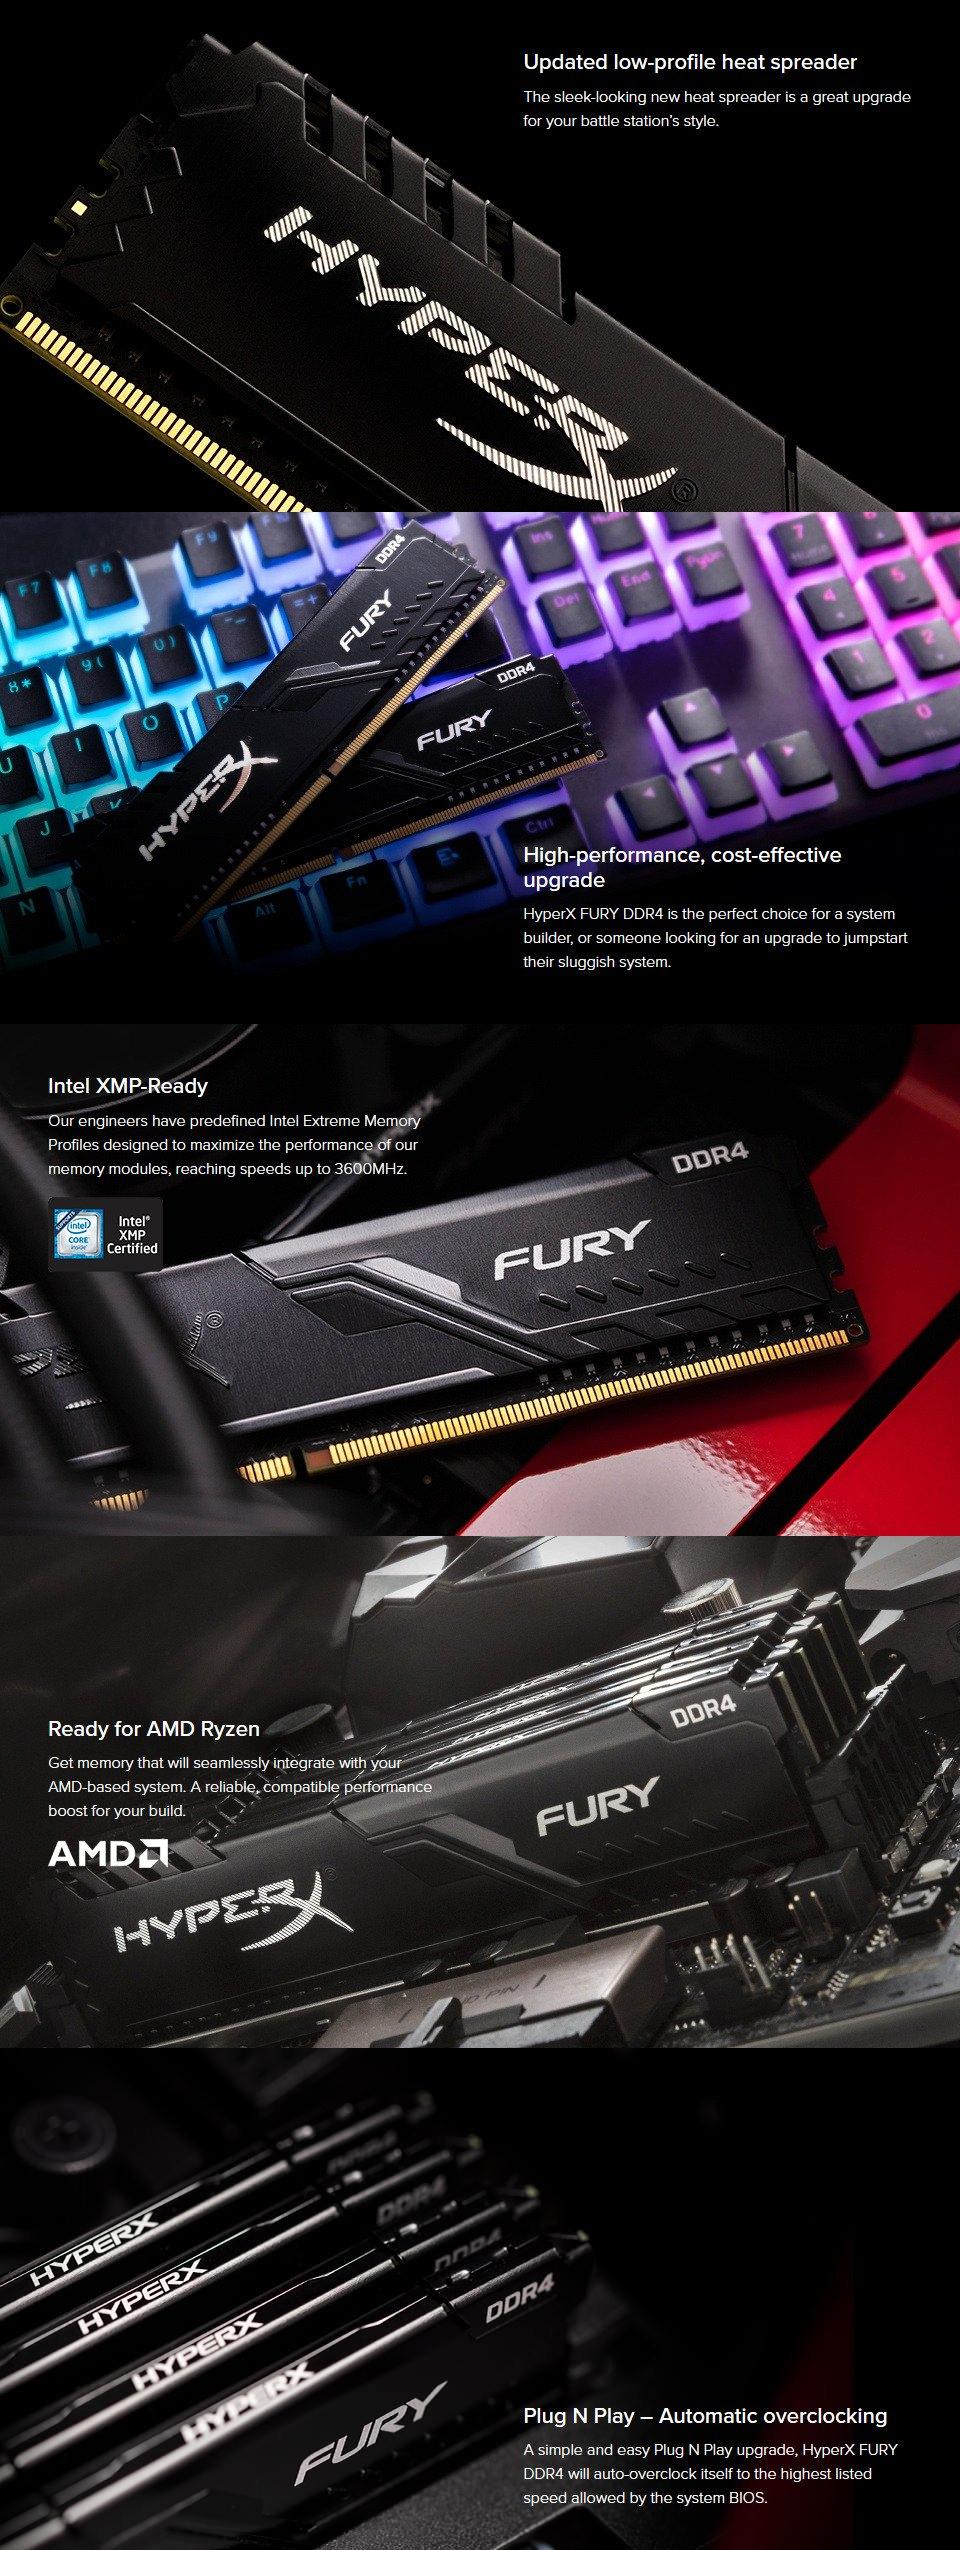 Kingston HyperX Fury 16GB (2x8GB) 3600MHz CL17 DDR4 Black features